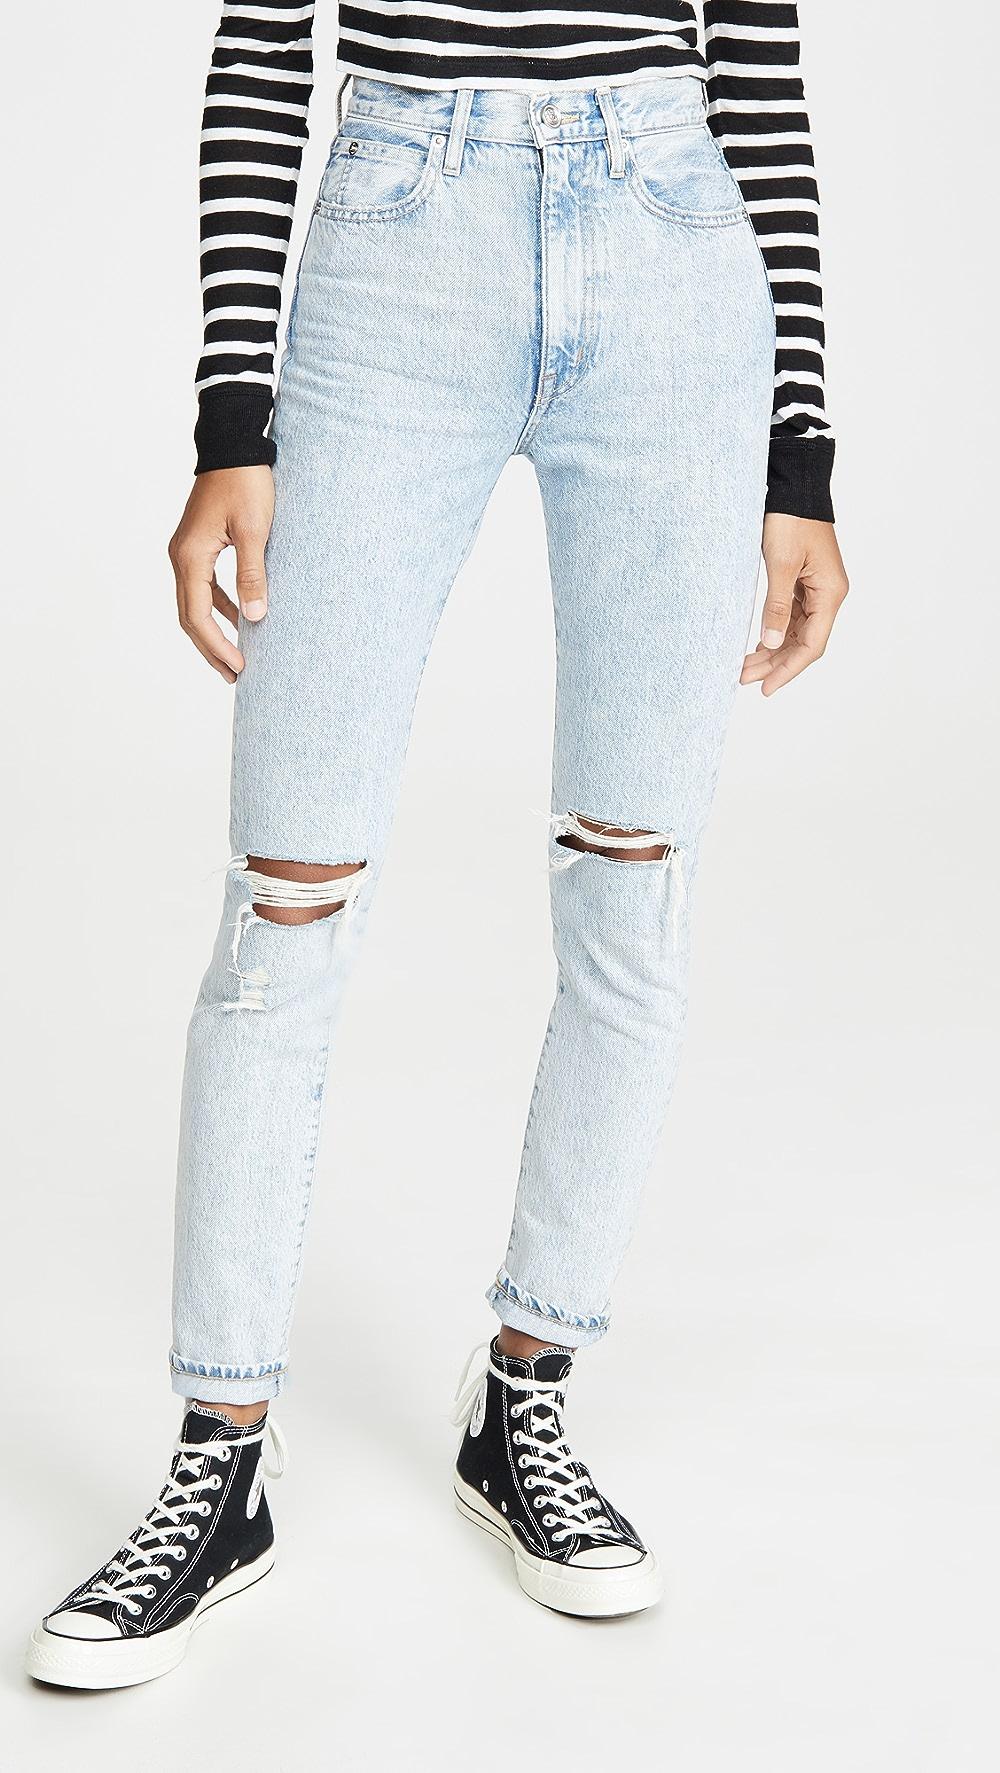 Hearty Slvrlake - Beatnik Jeans Clear-Cut Texture